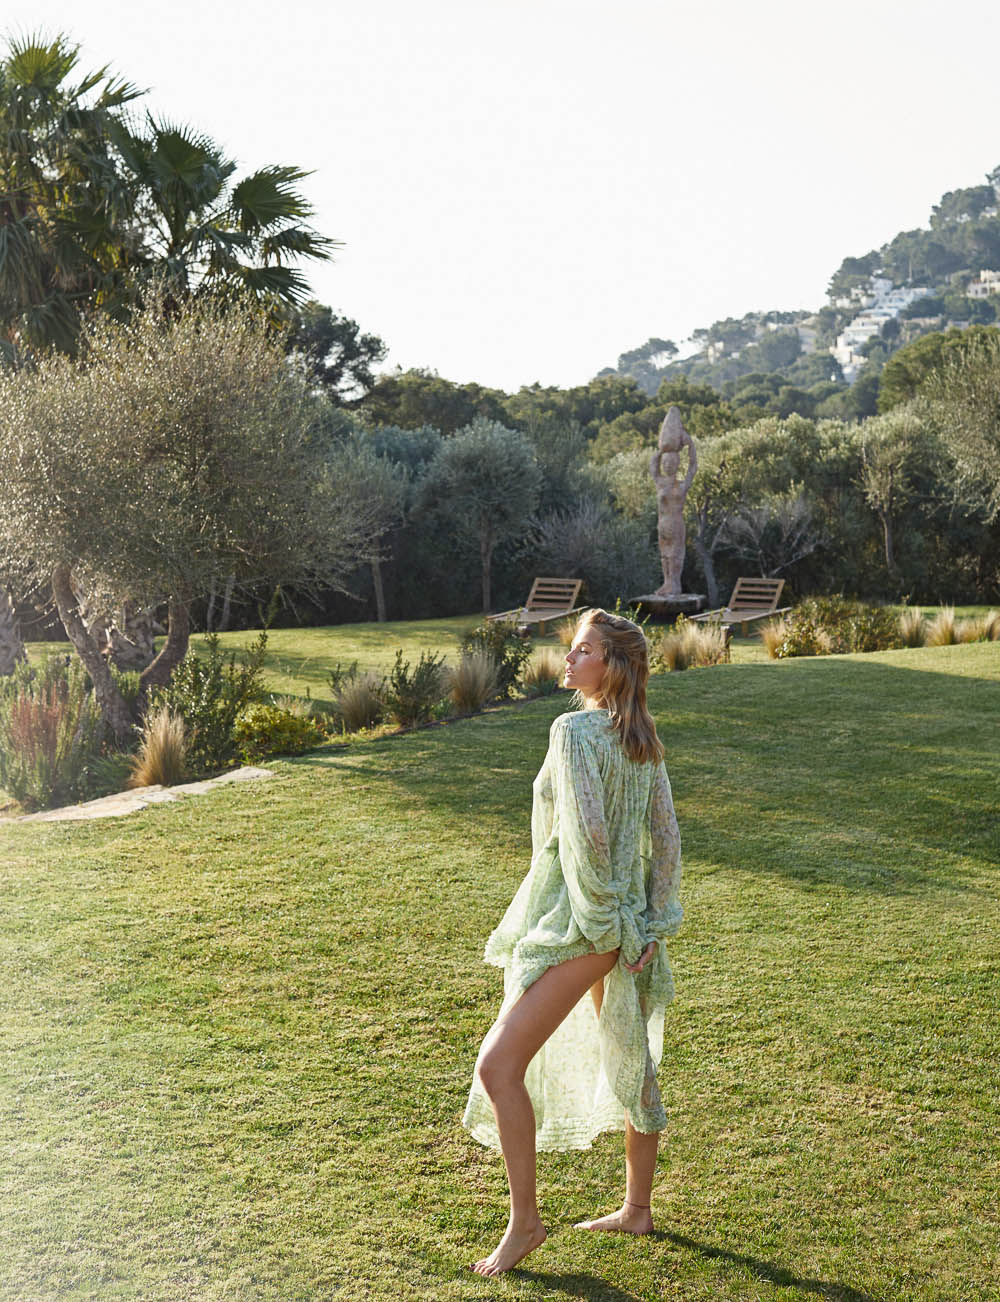 Toni Garrn covers Elle Spain May 2019 by Xavi Gordo